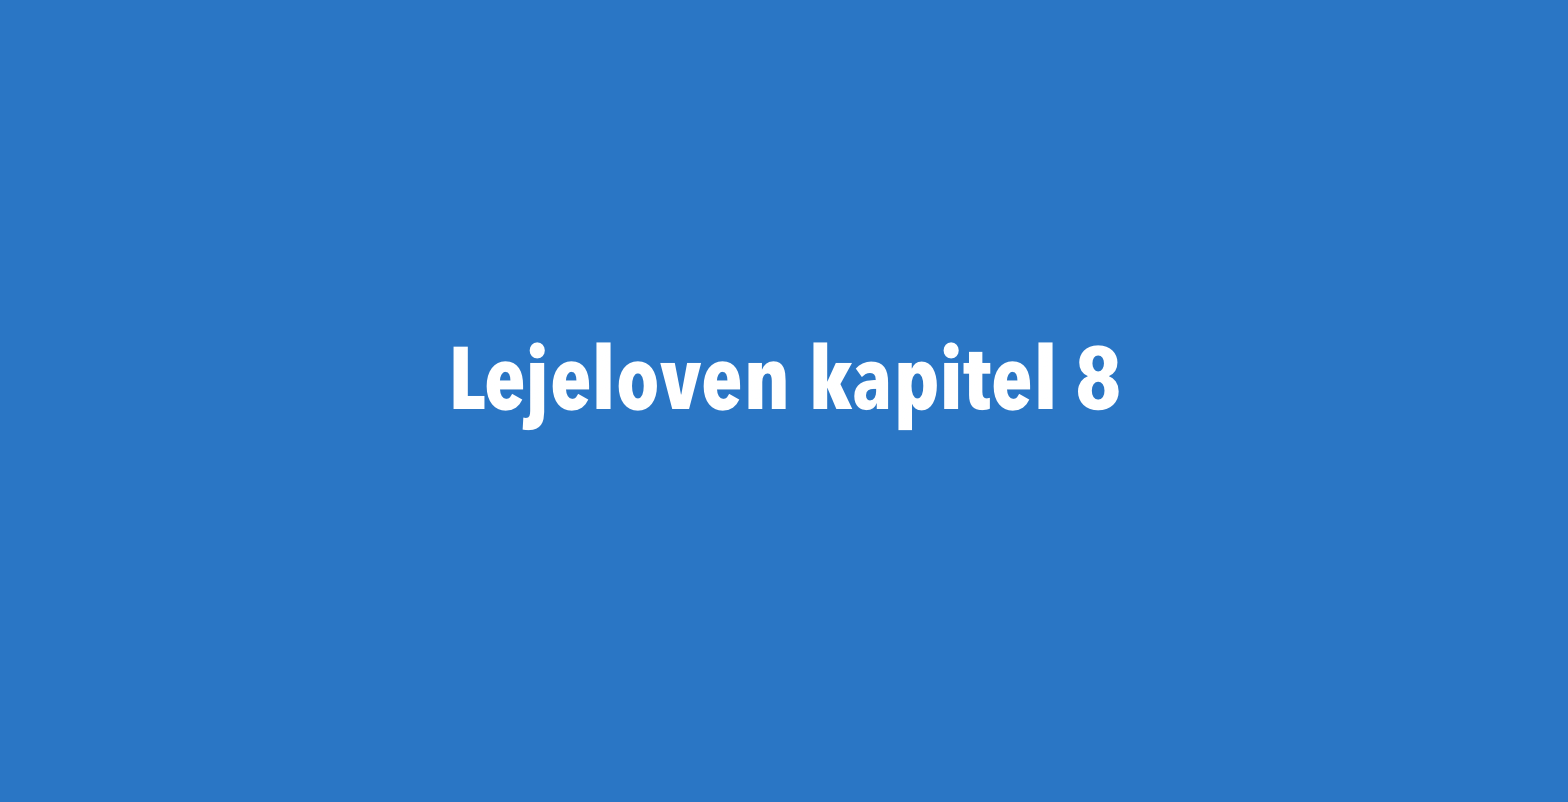 lejelovens kapital 8